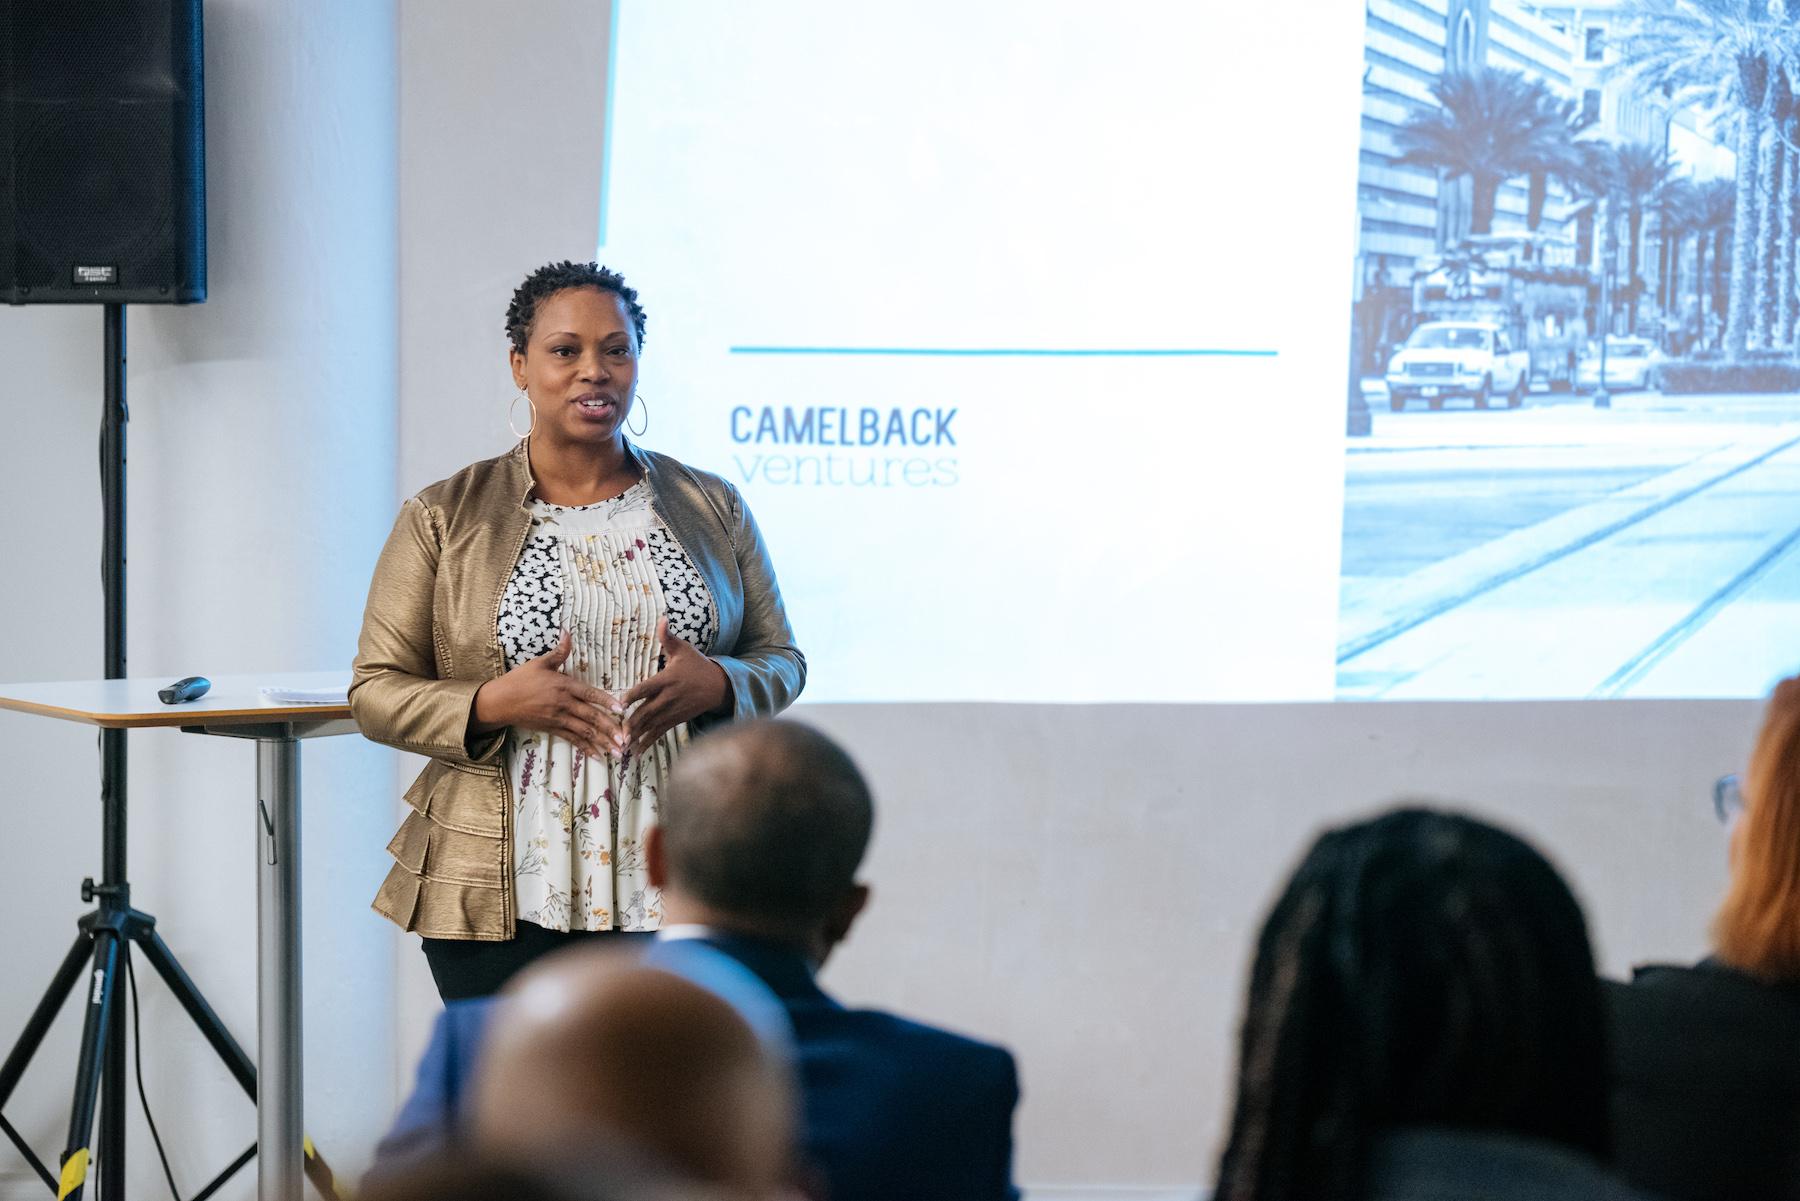 Gigsy; 2019-01-25; Camelback Ventures - Award Presentation; 031.jpg